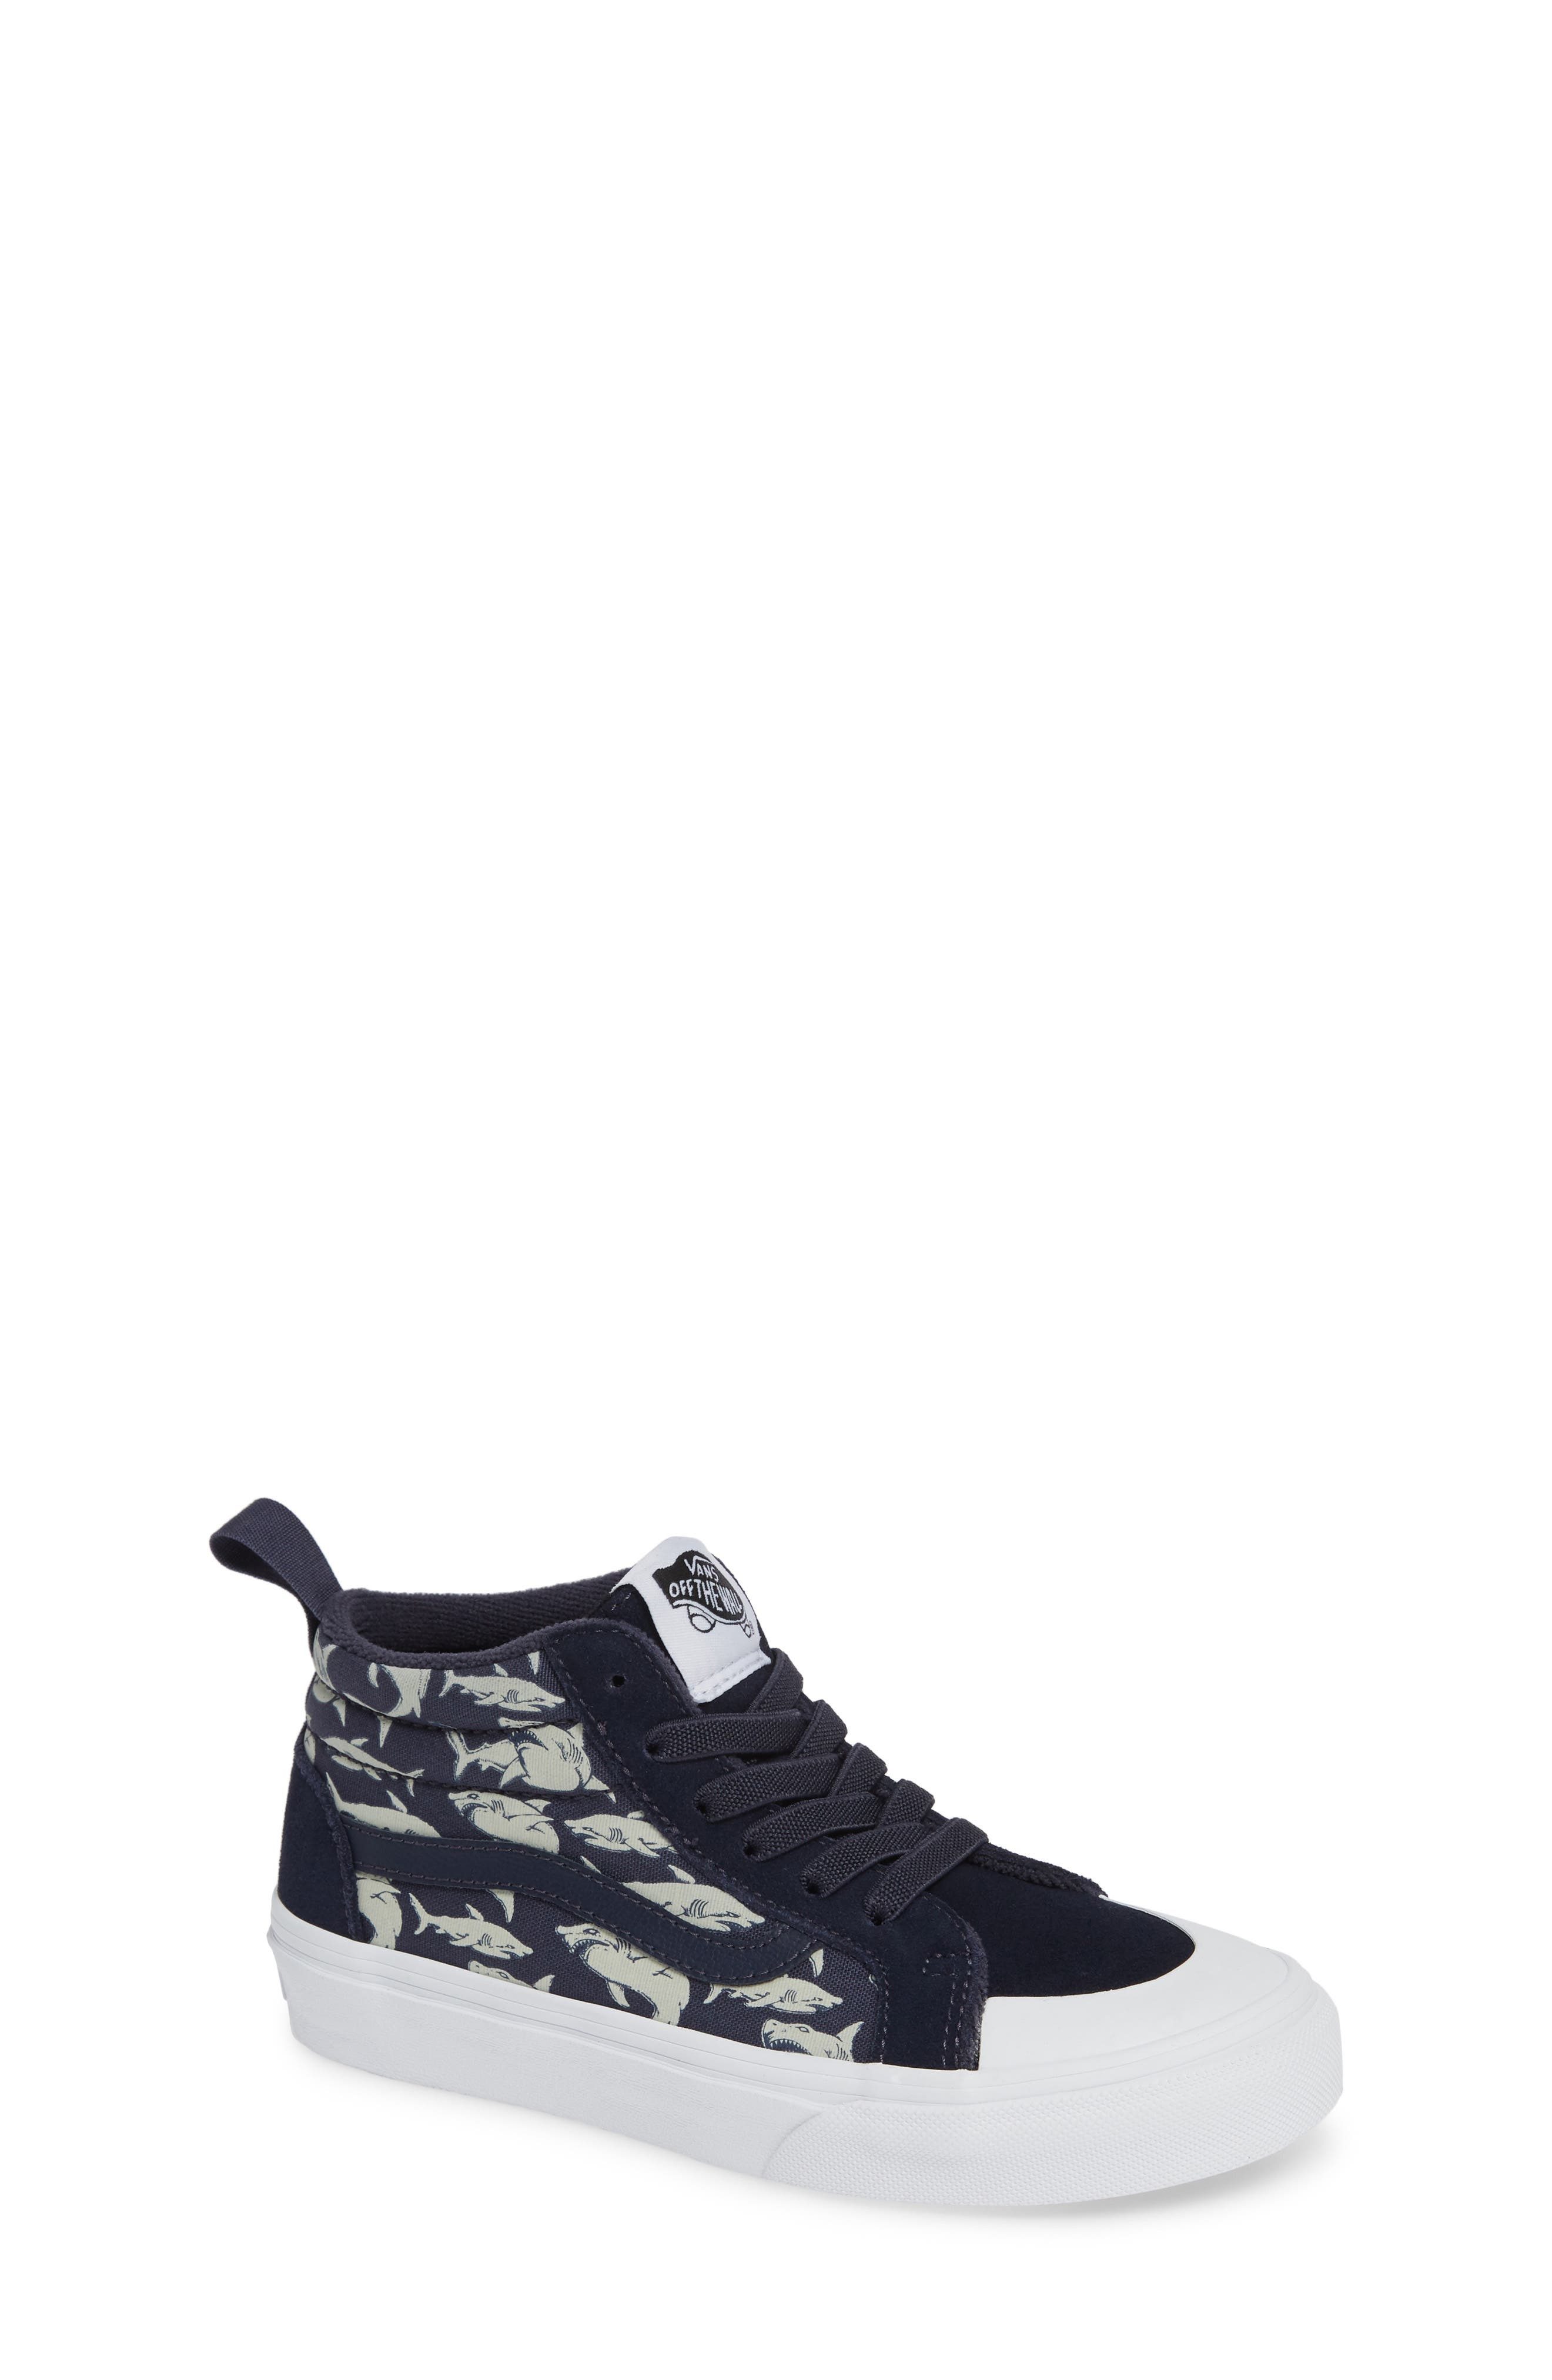 Racer Mid Elastic Lace Sneaker,                             Main thumbnail 1, color,                             GLOW SHARKS PARISIAN NIGHT